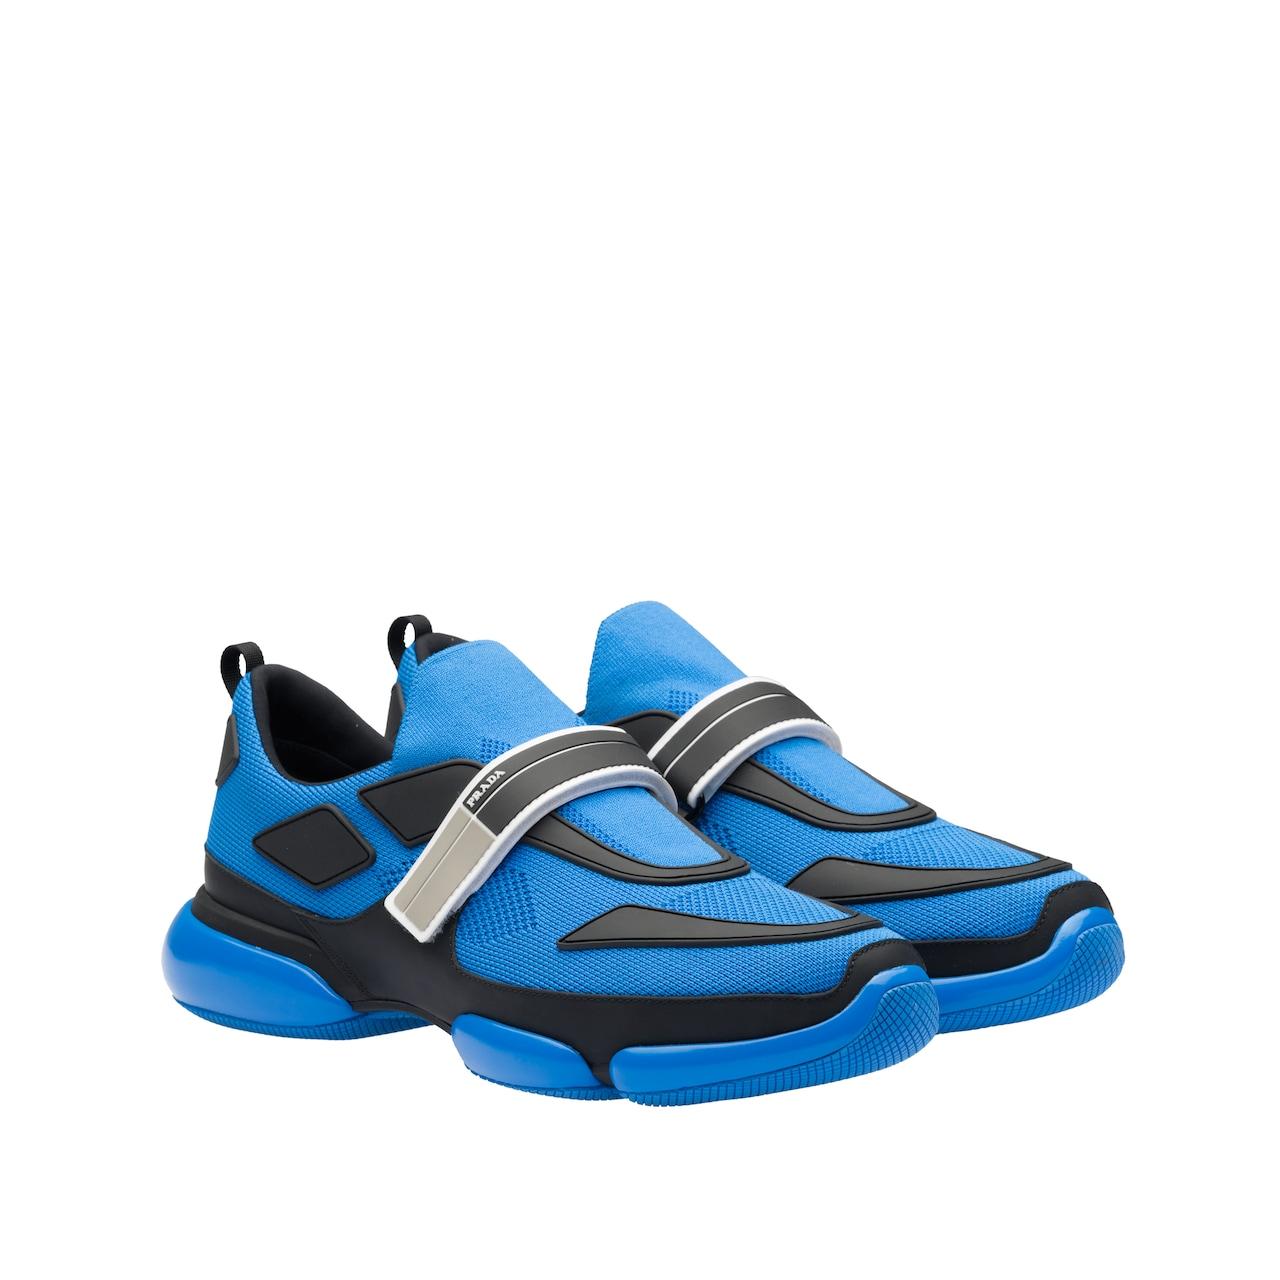 Prada Cloudbust 运动鞋